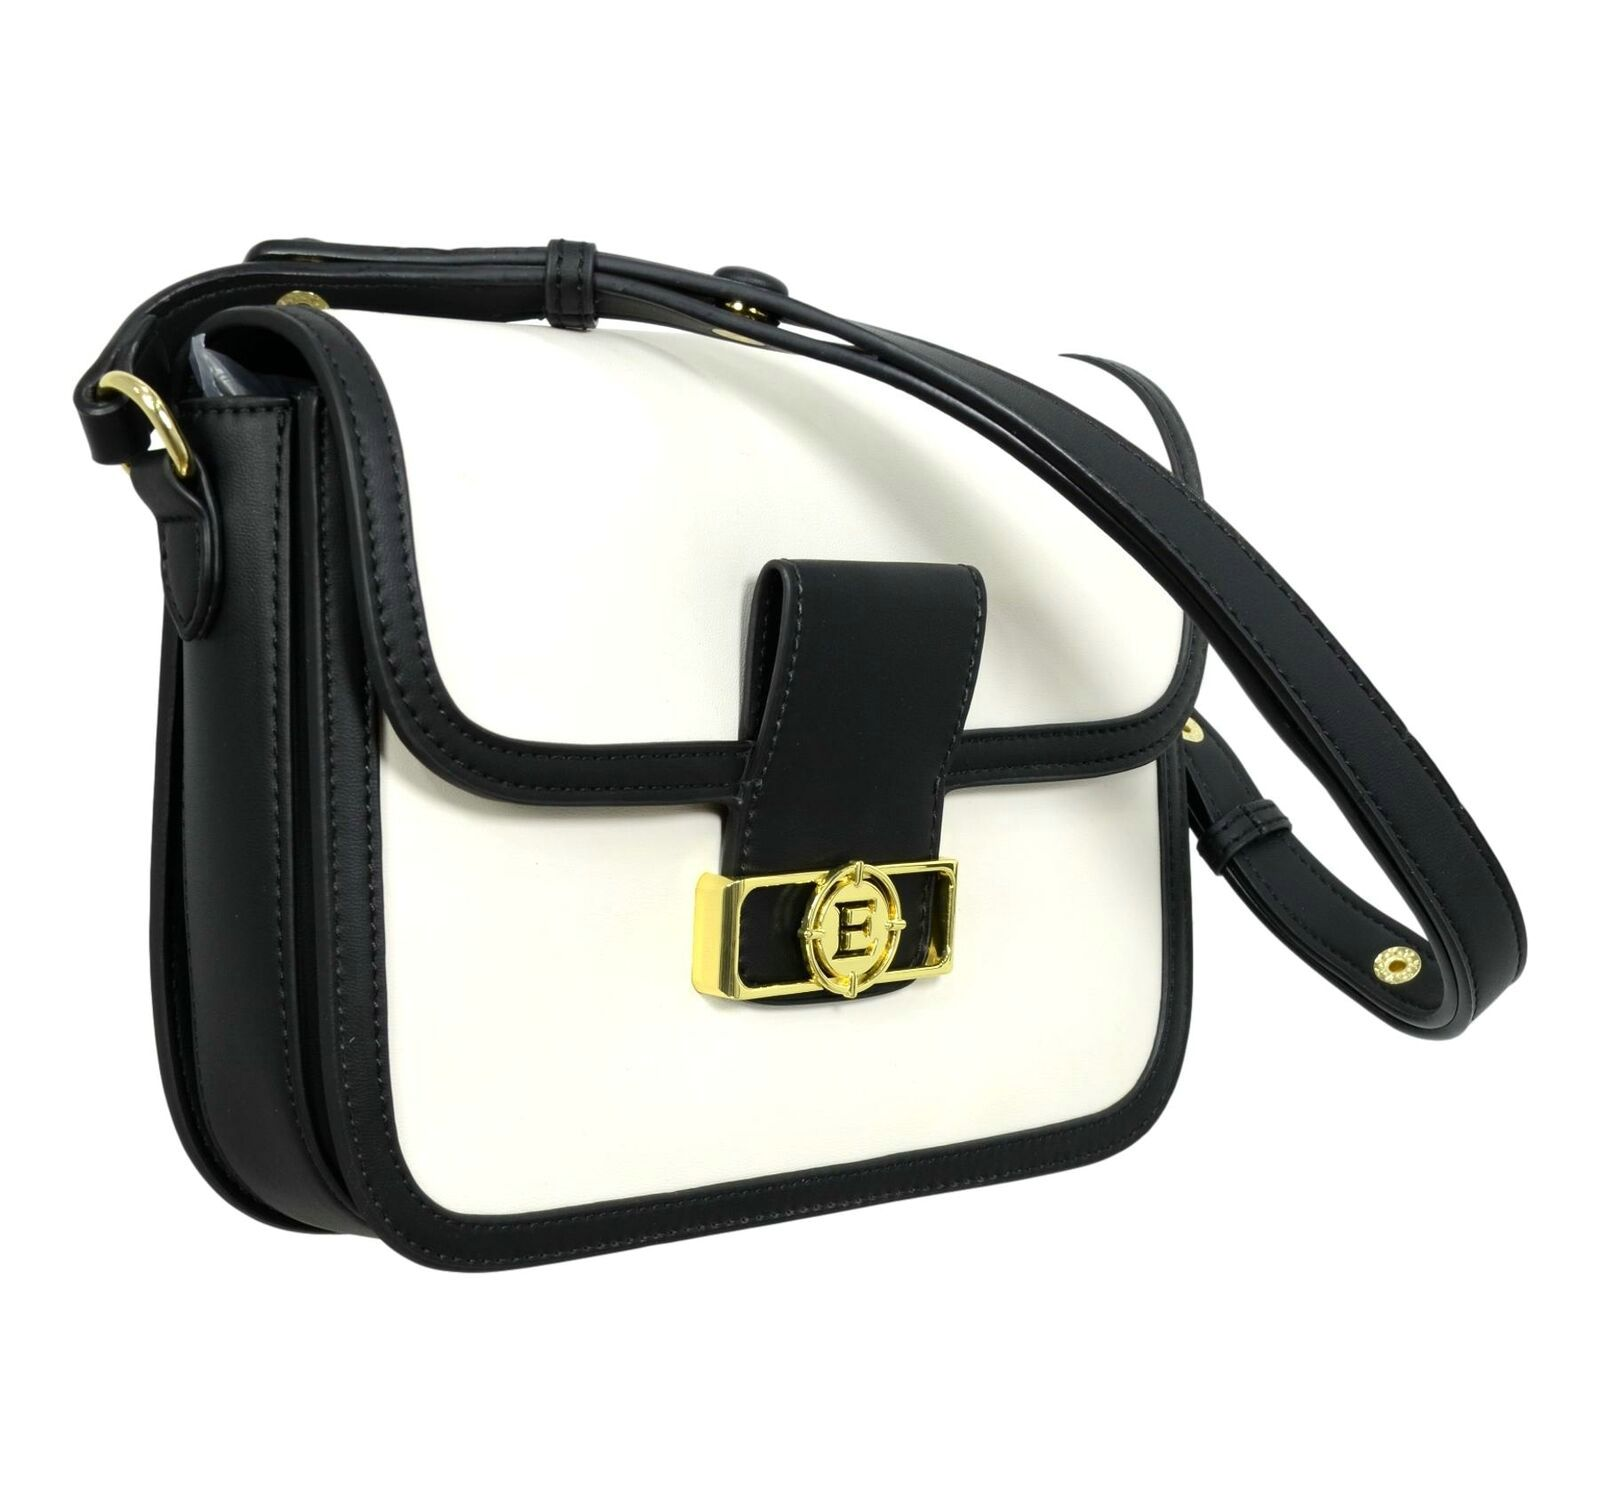 Borsa Ermanno Scervino Medium Flap Bag Joey 12401155 whiteblack laterale